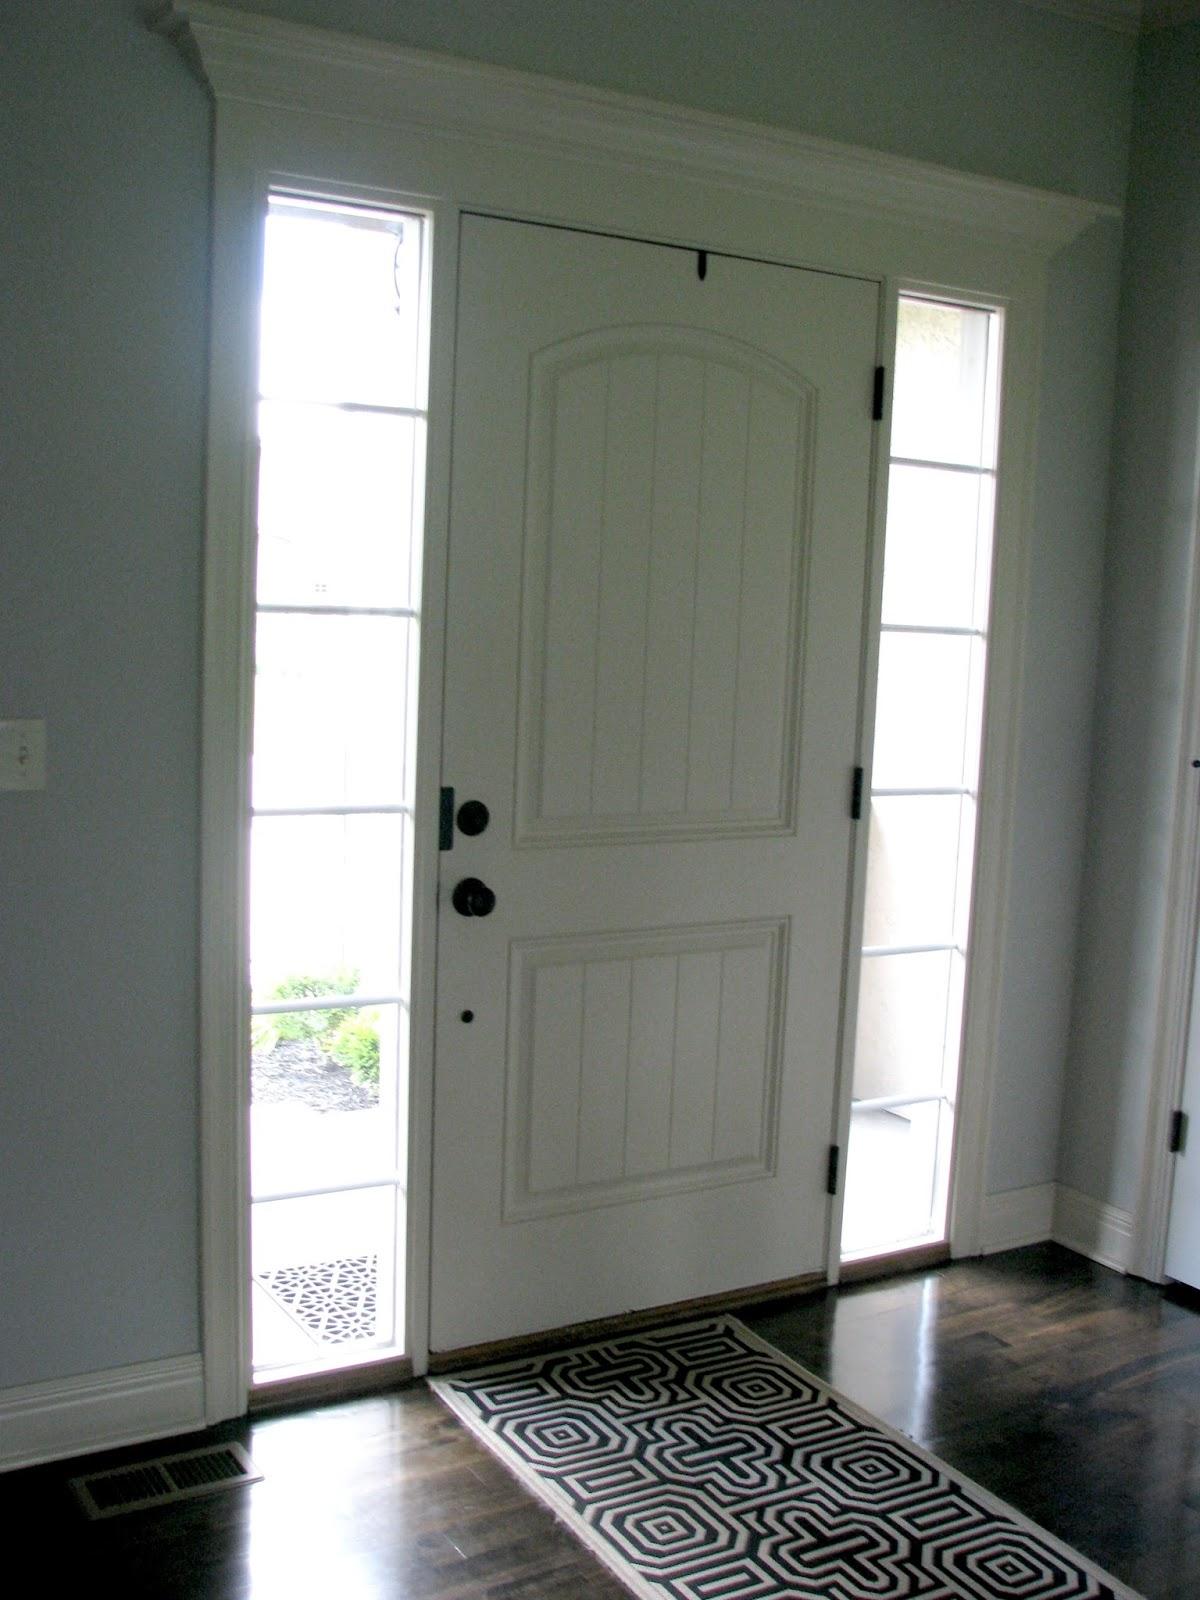 Black interior front door - Now That The Door Is Black The Moldings Stand Out And The Door Doesn T Look So Builder Grade